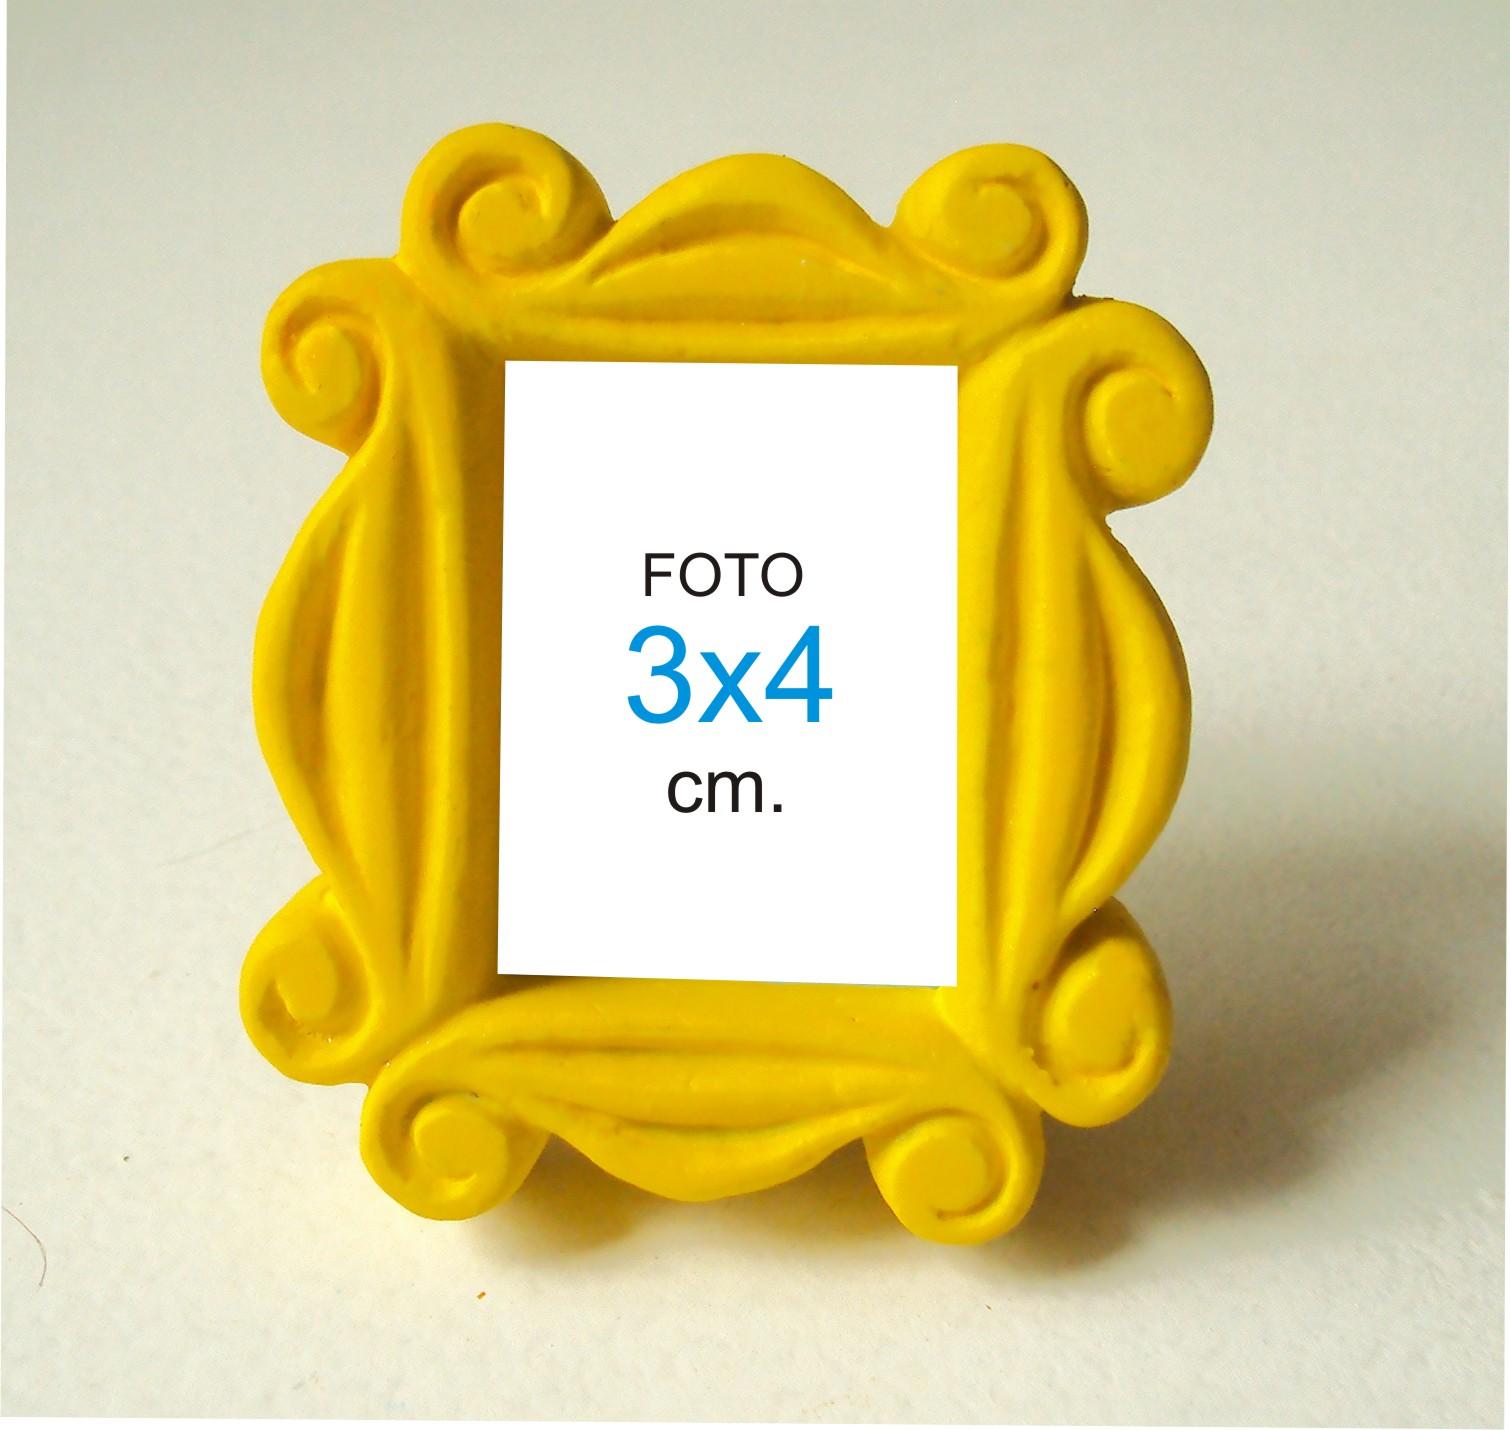 porta retrato 3 4 mini moldura friends artes resinas elo7. Black Bedroom Furniture Sets. Home Design Ideas